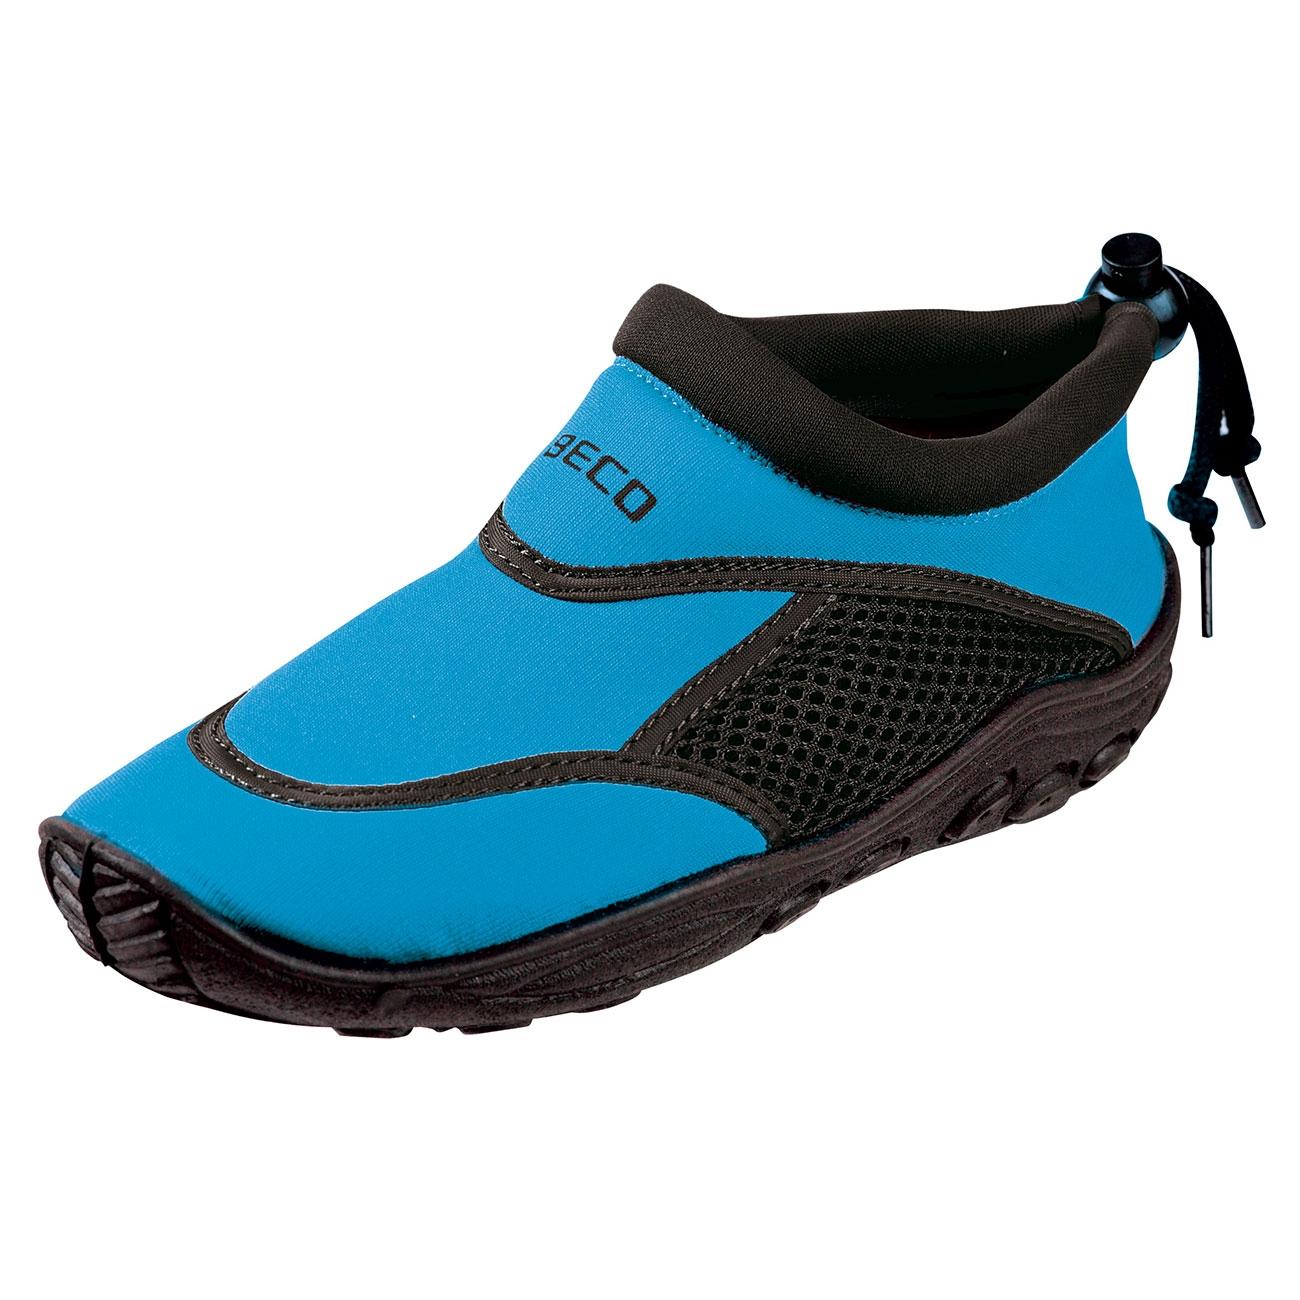 d09044c503c beco-badesko-bade-sko-swim-shoes-swimwear-blue-